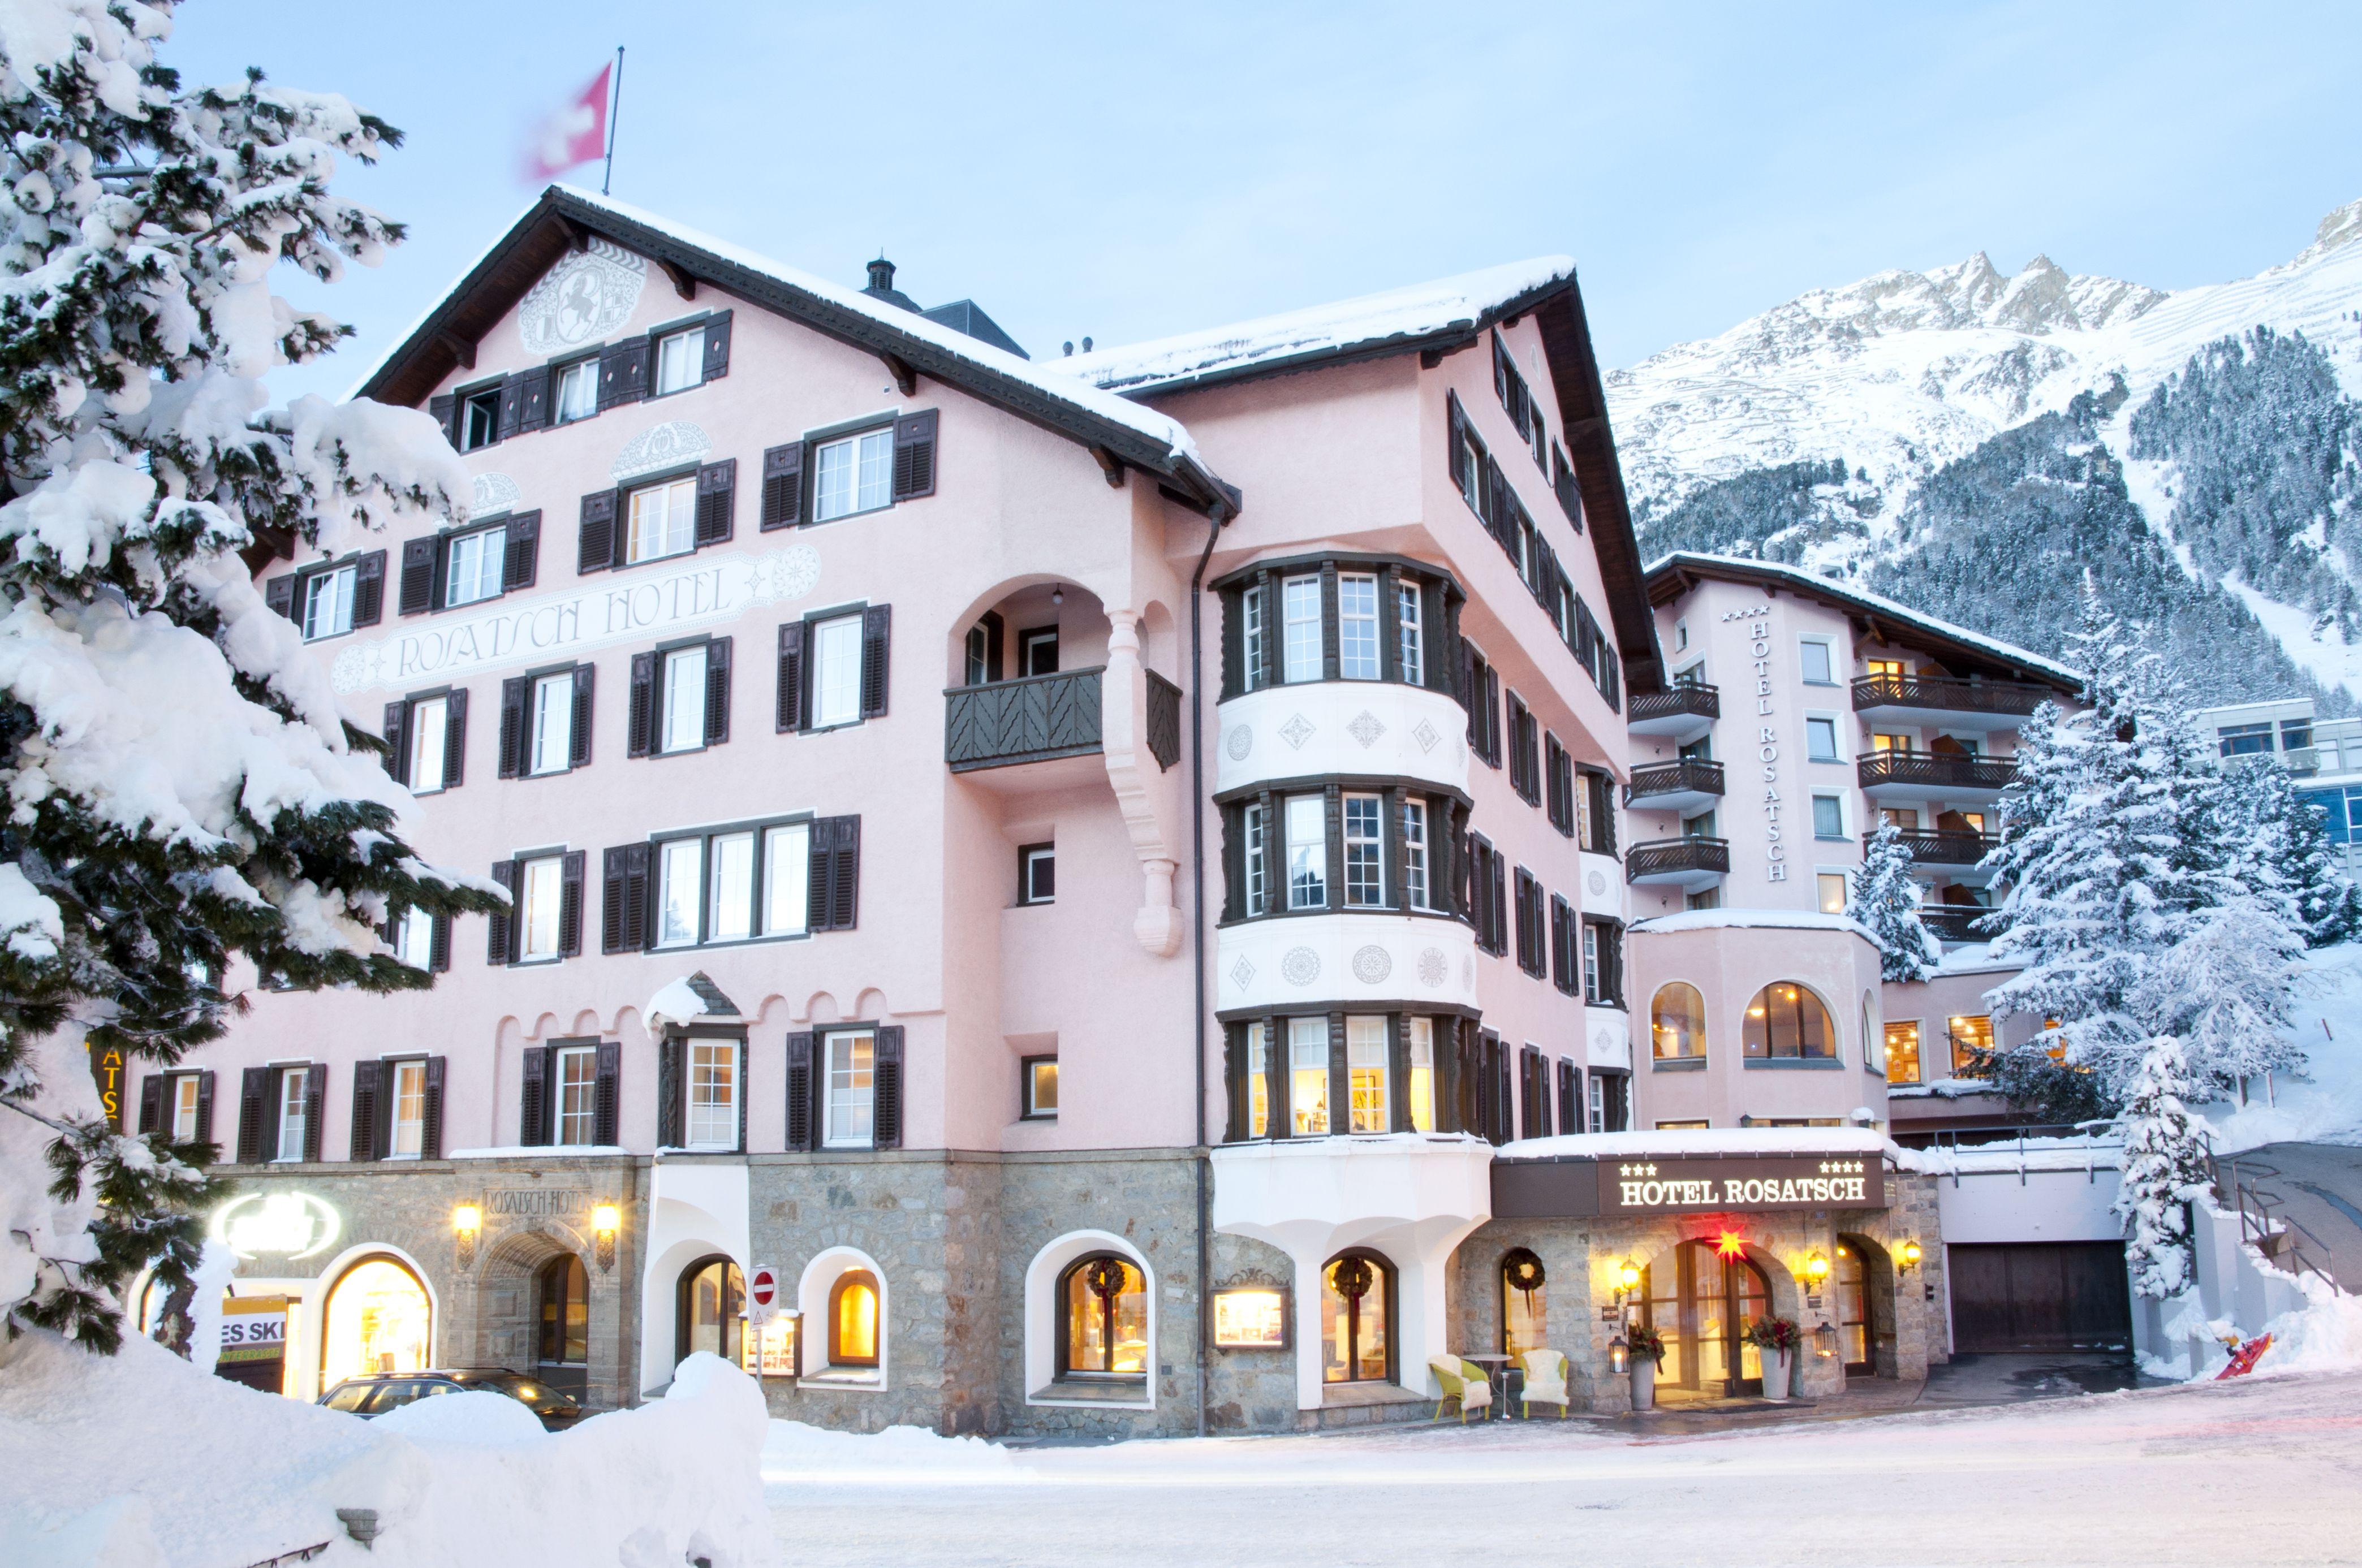 Hotel Rosatsch Résidence